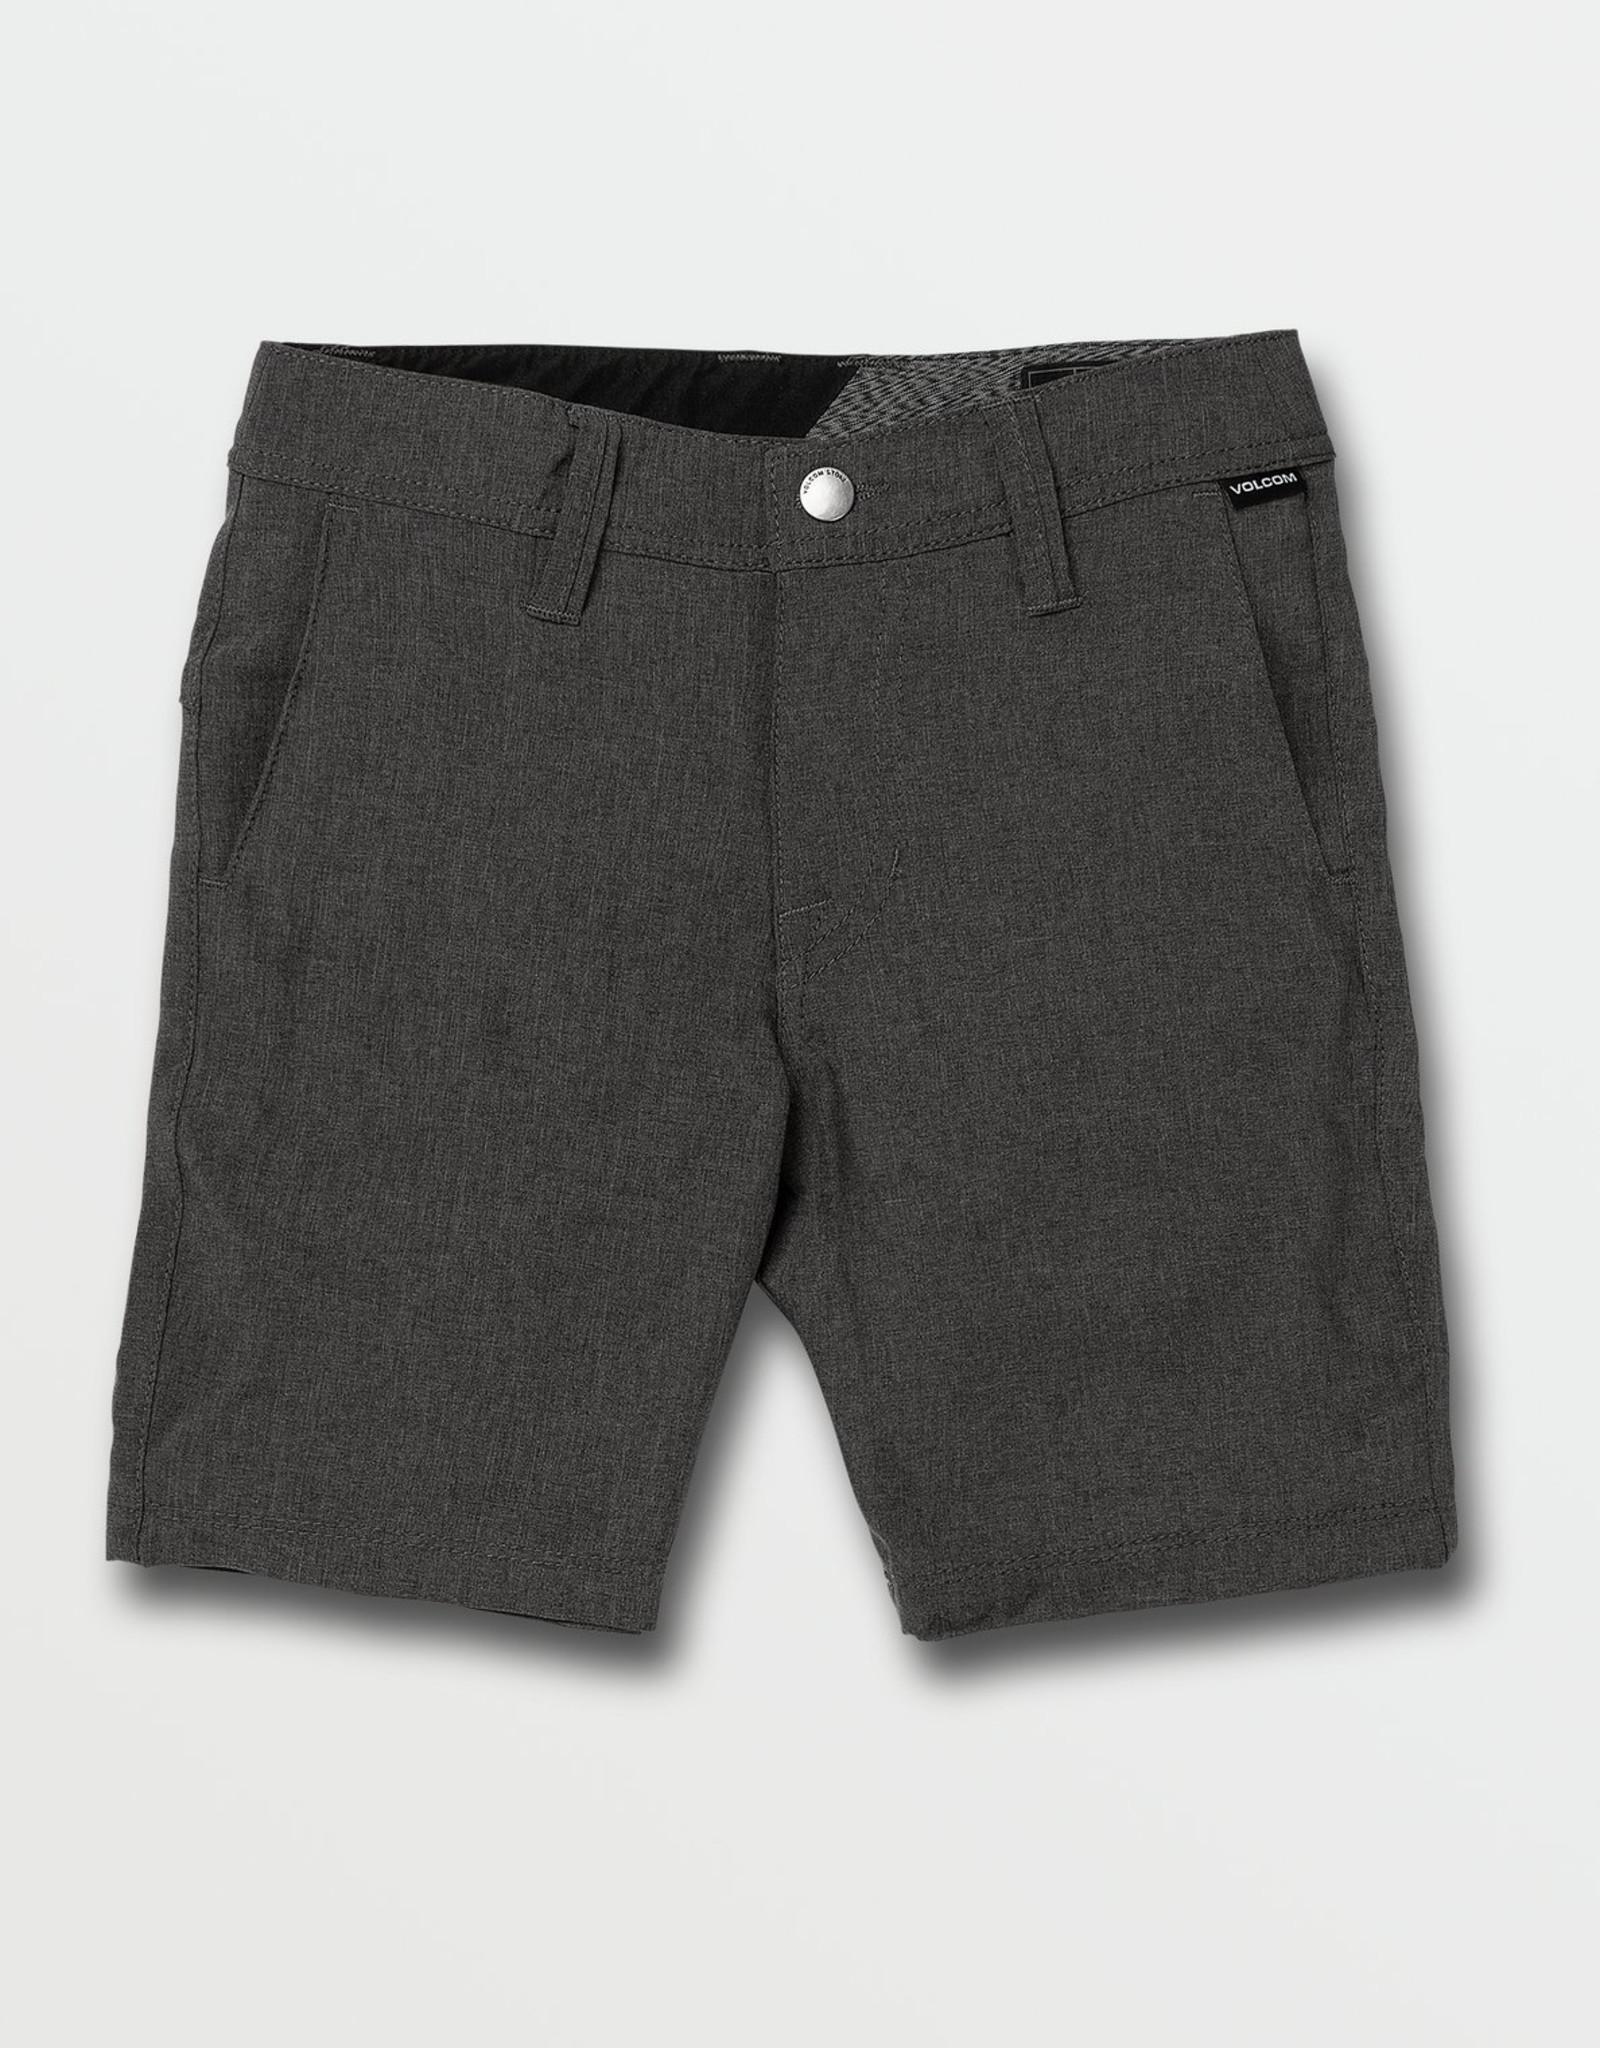 Volcom SP21 B Static Short Grey